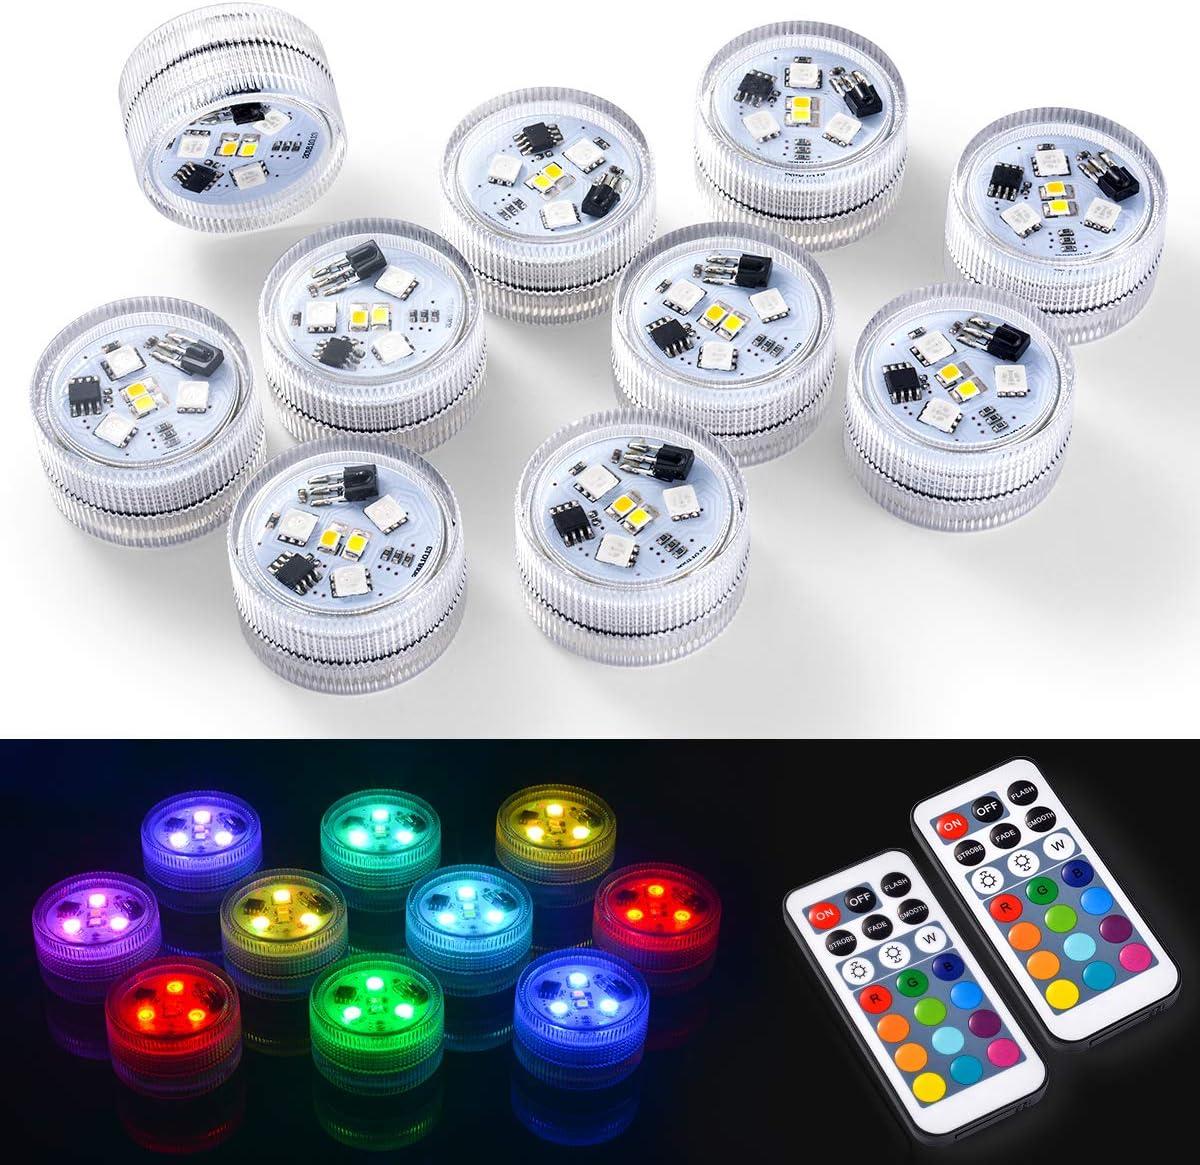 10x Luces LED Sumergible, Multicolor Impermeable Luz acuáticas Subacuáticas